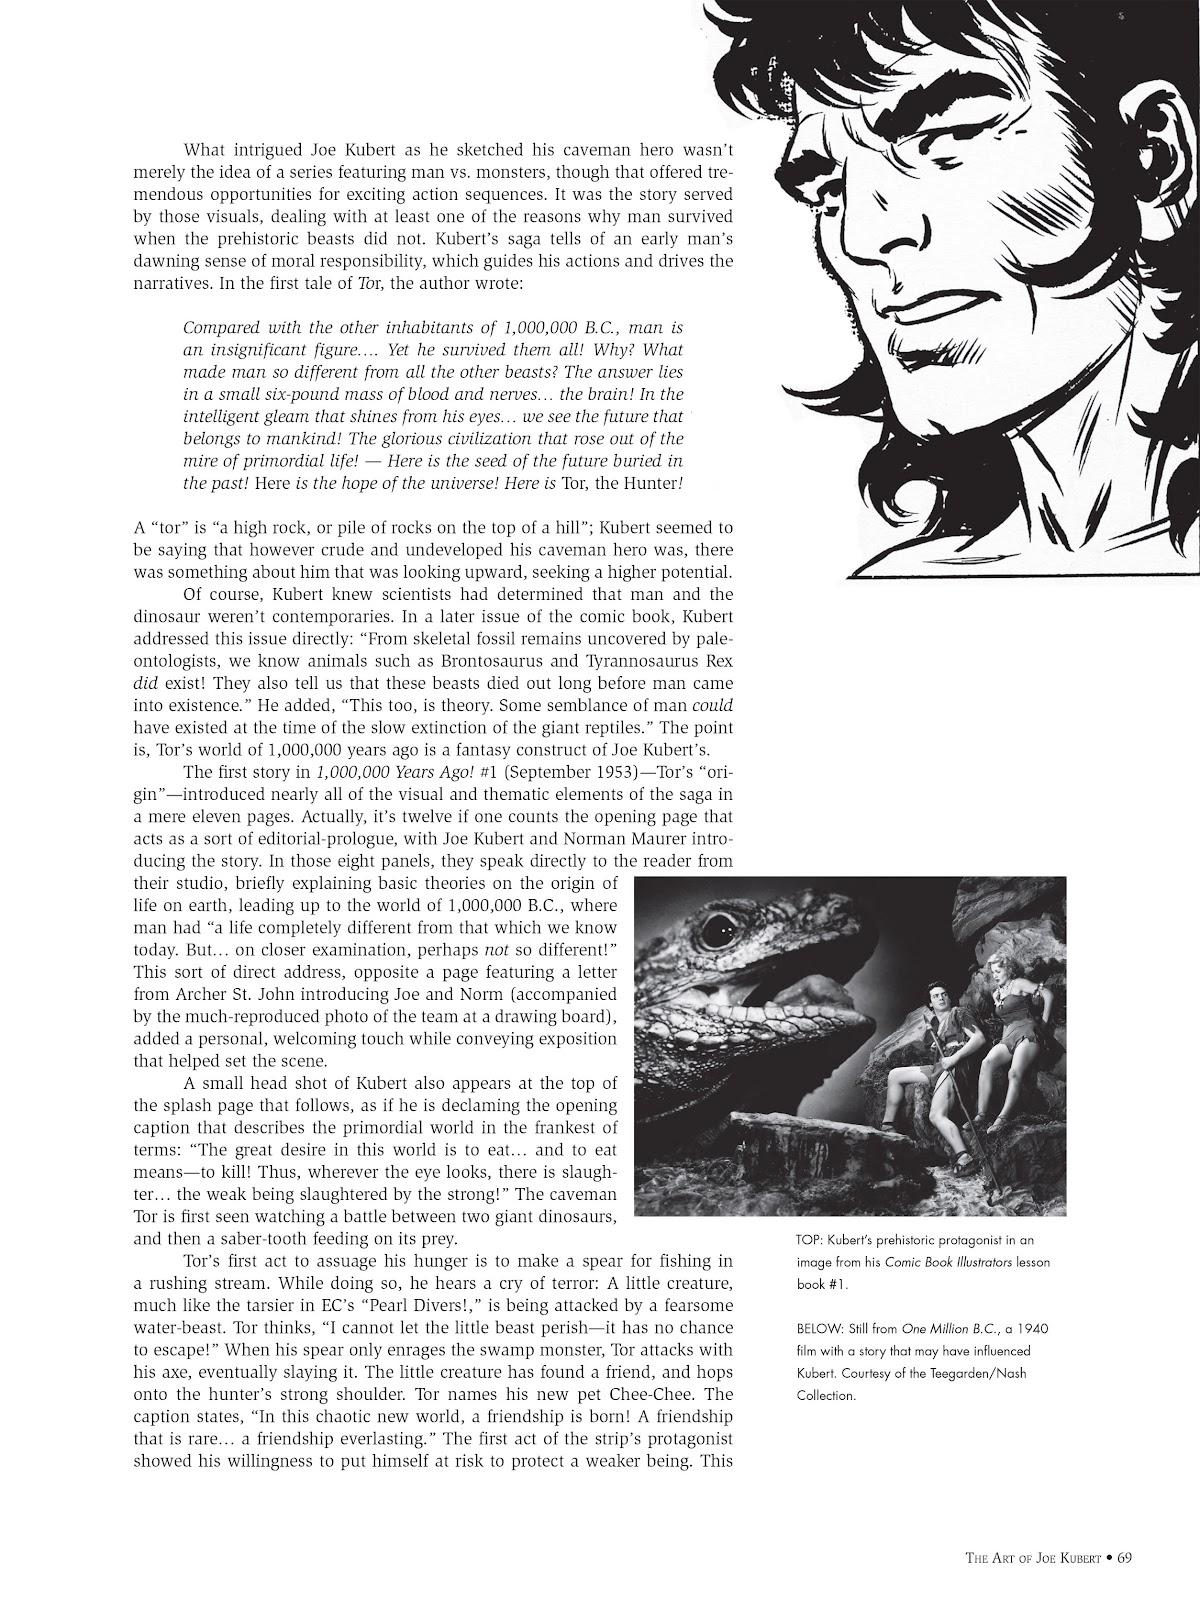 Read online The Art of Joe Kubert comic -  Issue # TPB (Part 1) - 68